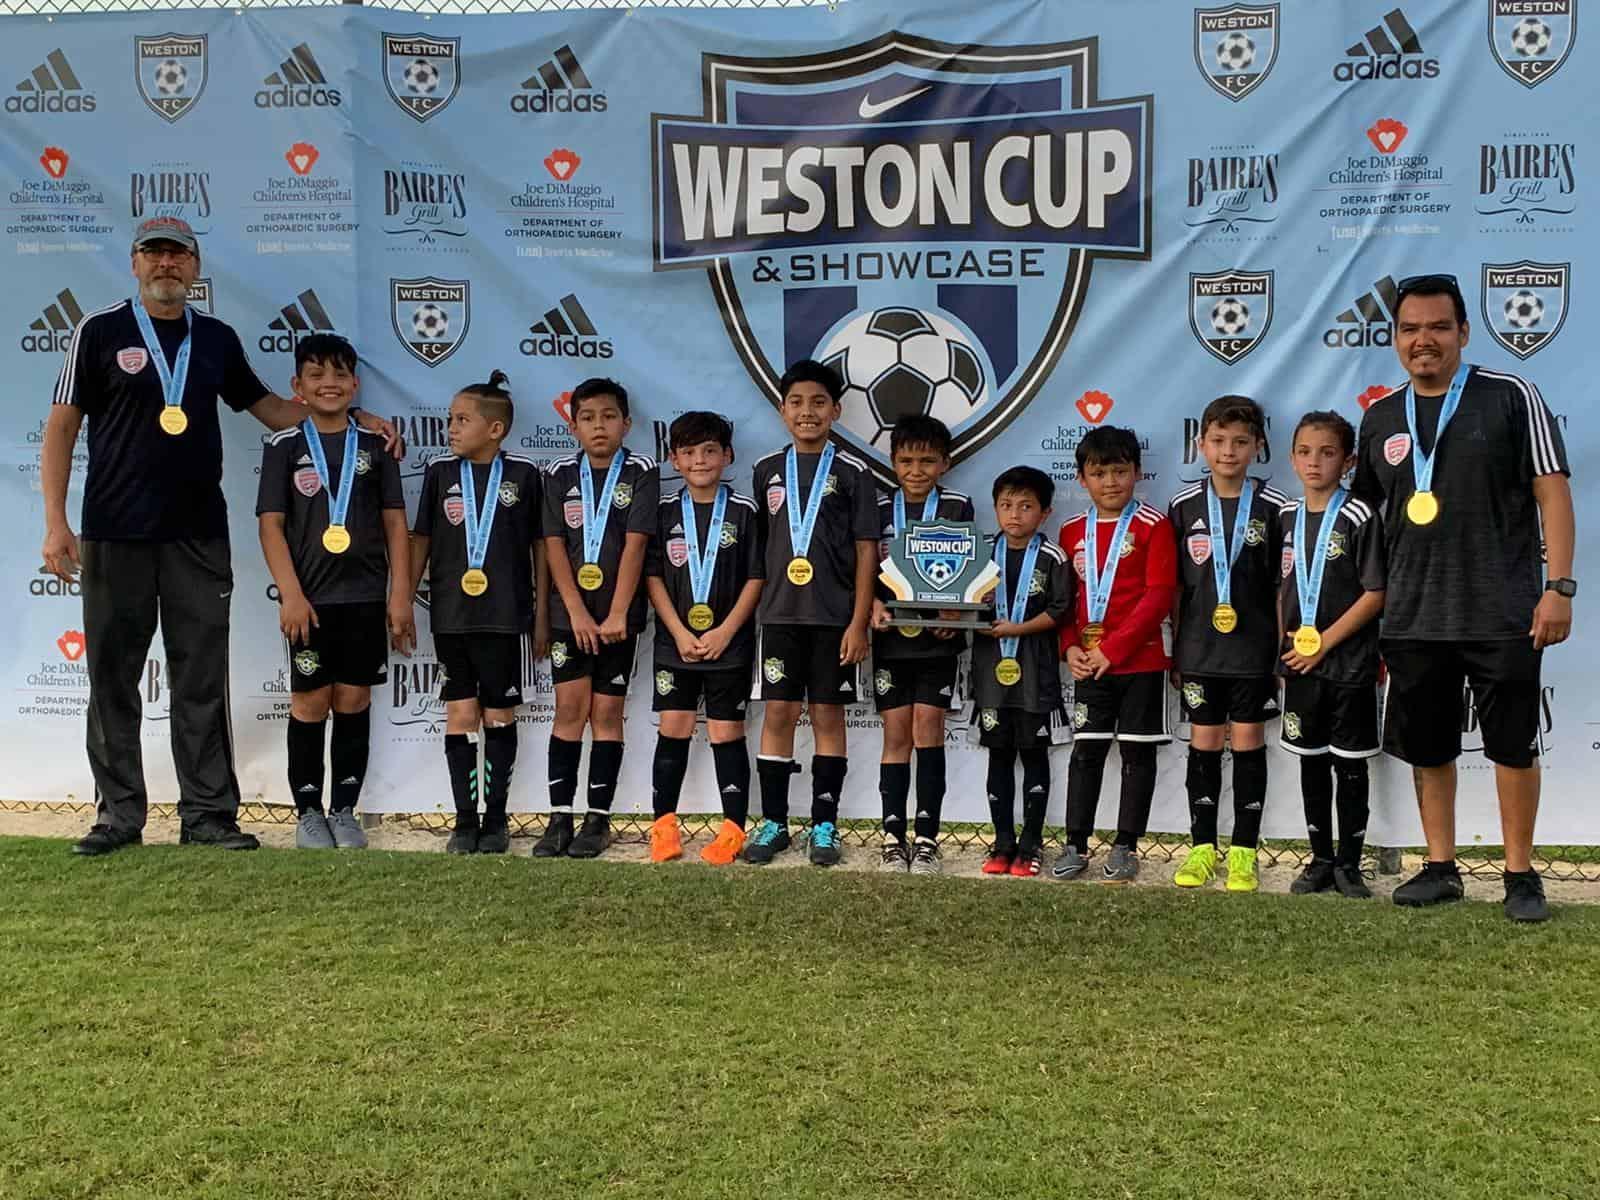 U10 Weston Cup Champs